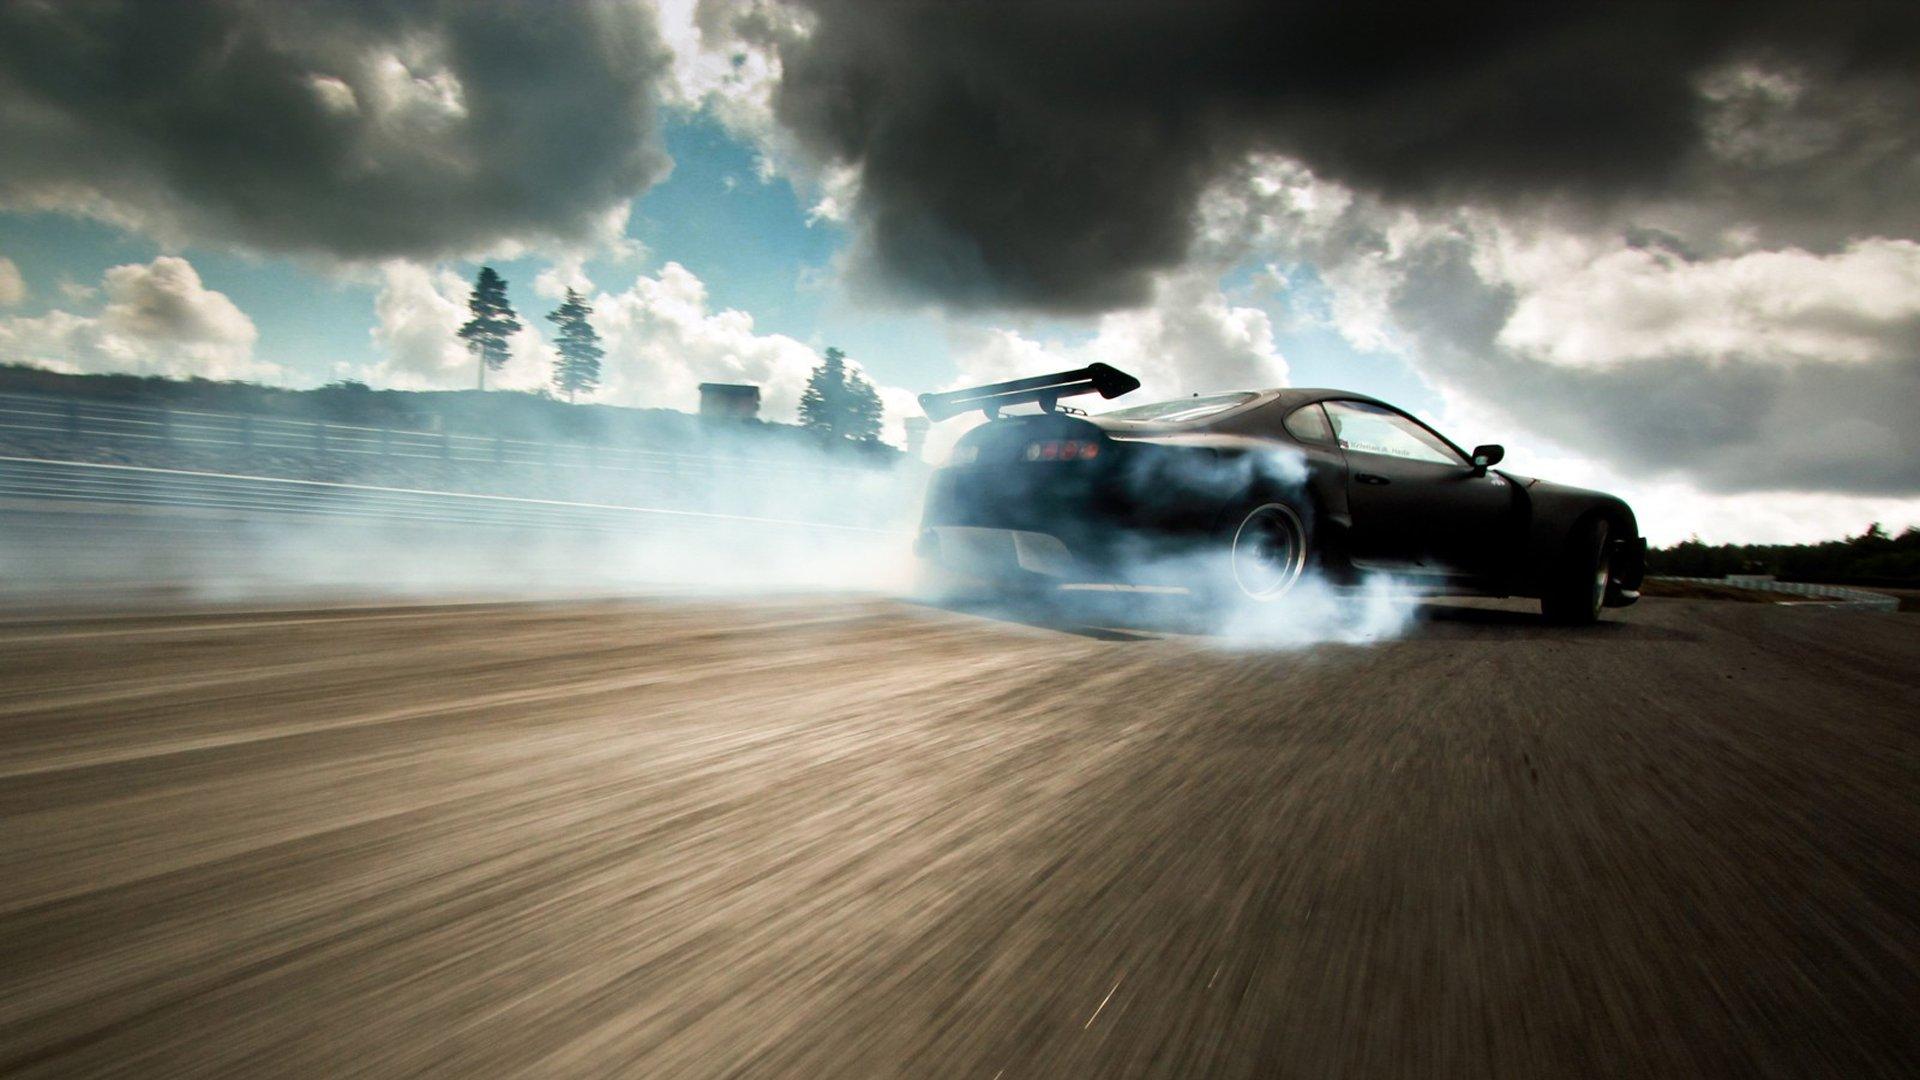 clouds cars toyota supra drifting wallpaper 1920x1080